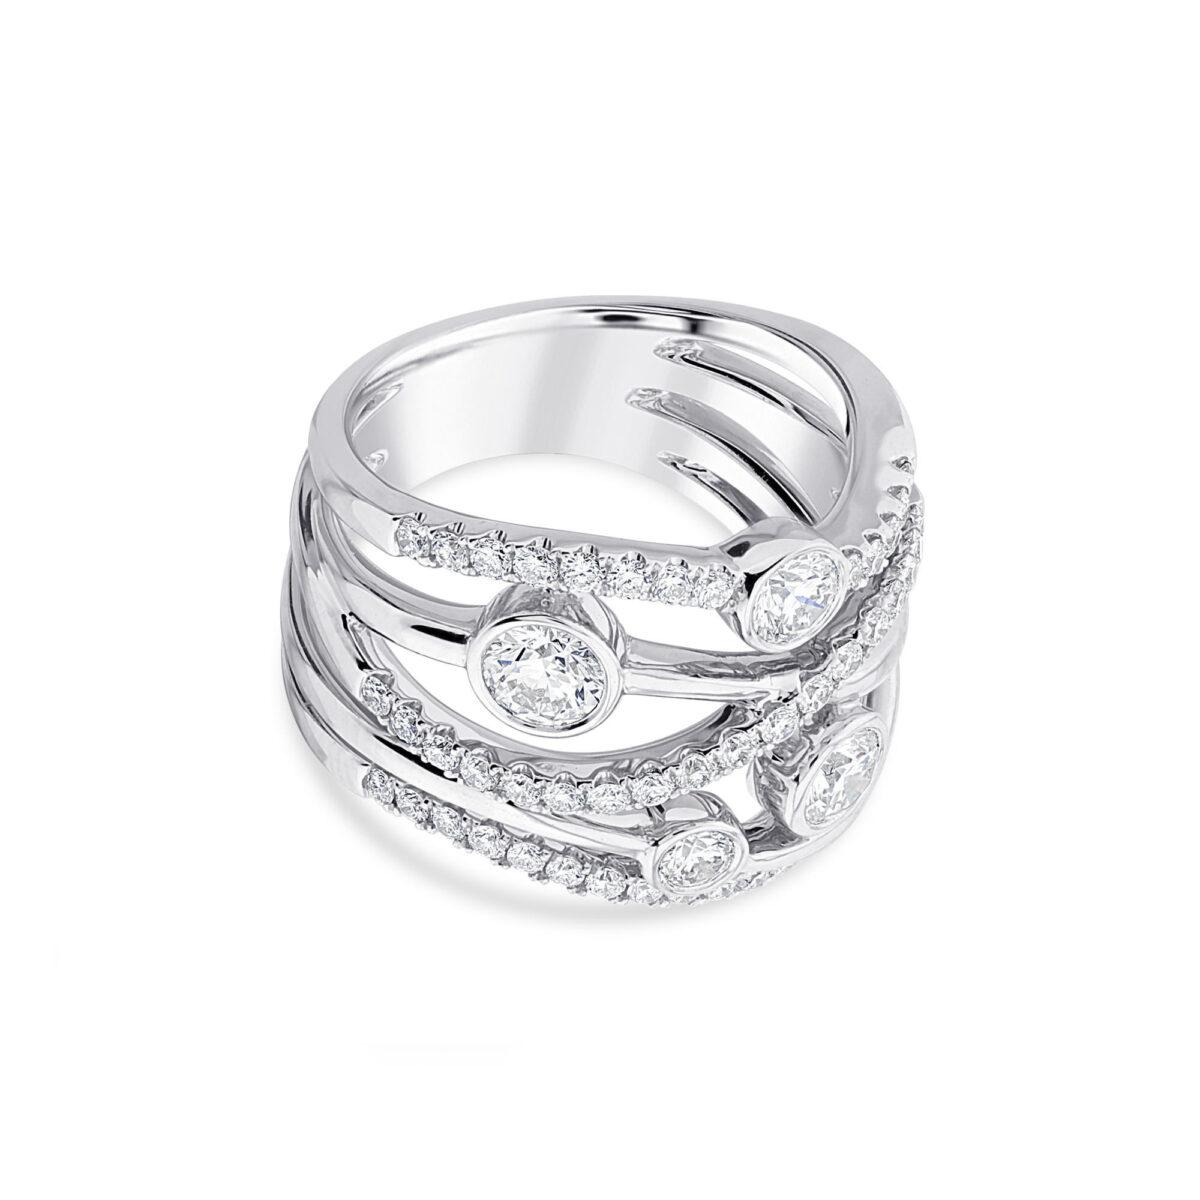 Lunar White Gold Diamond Ring